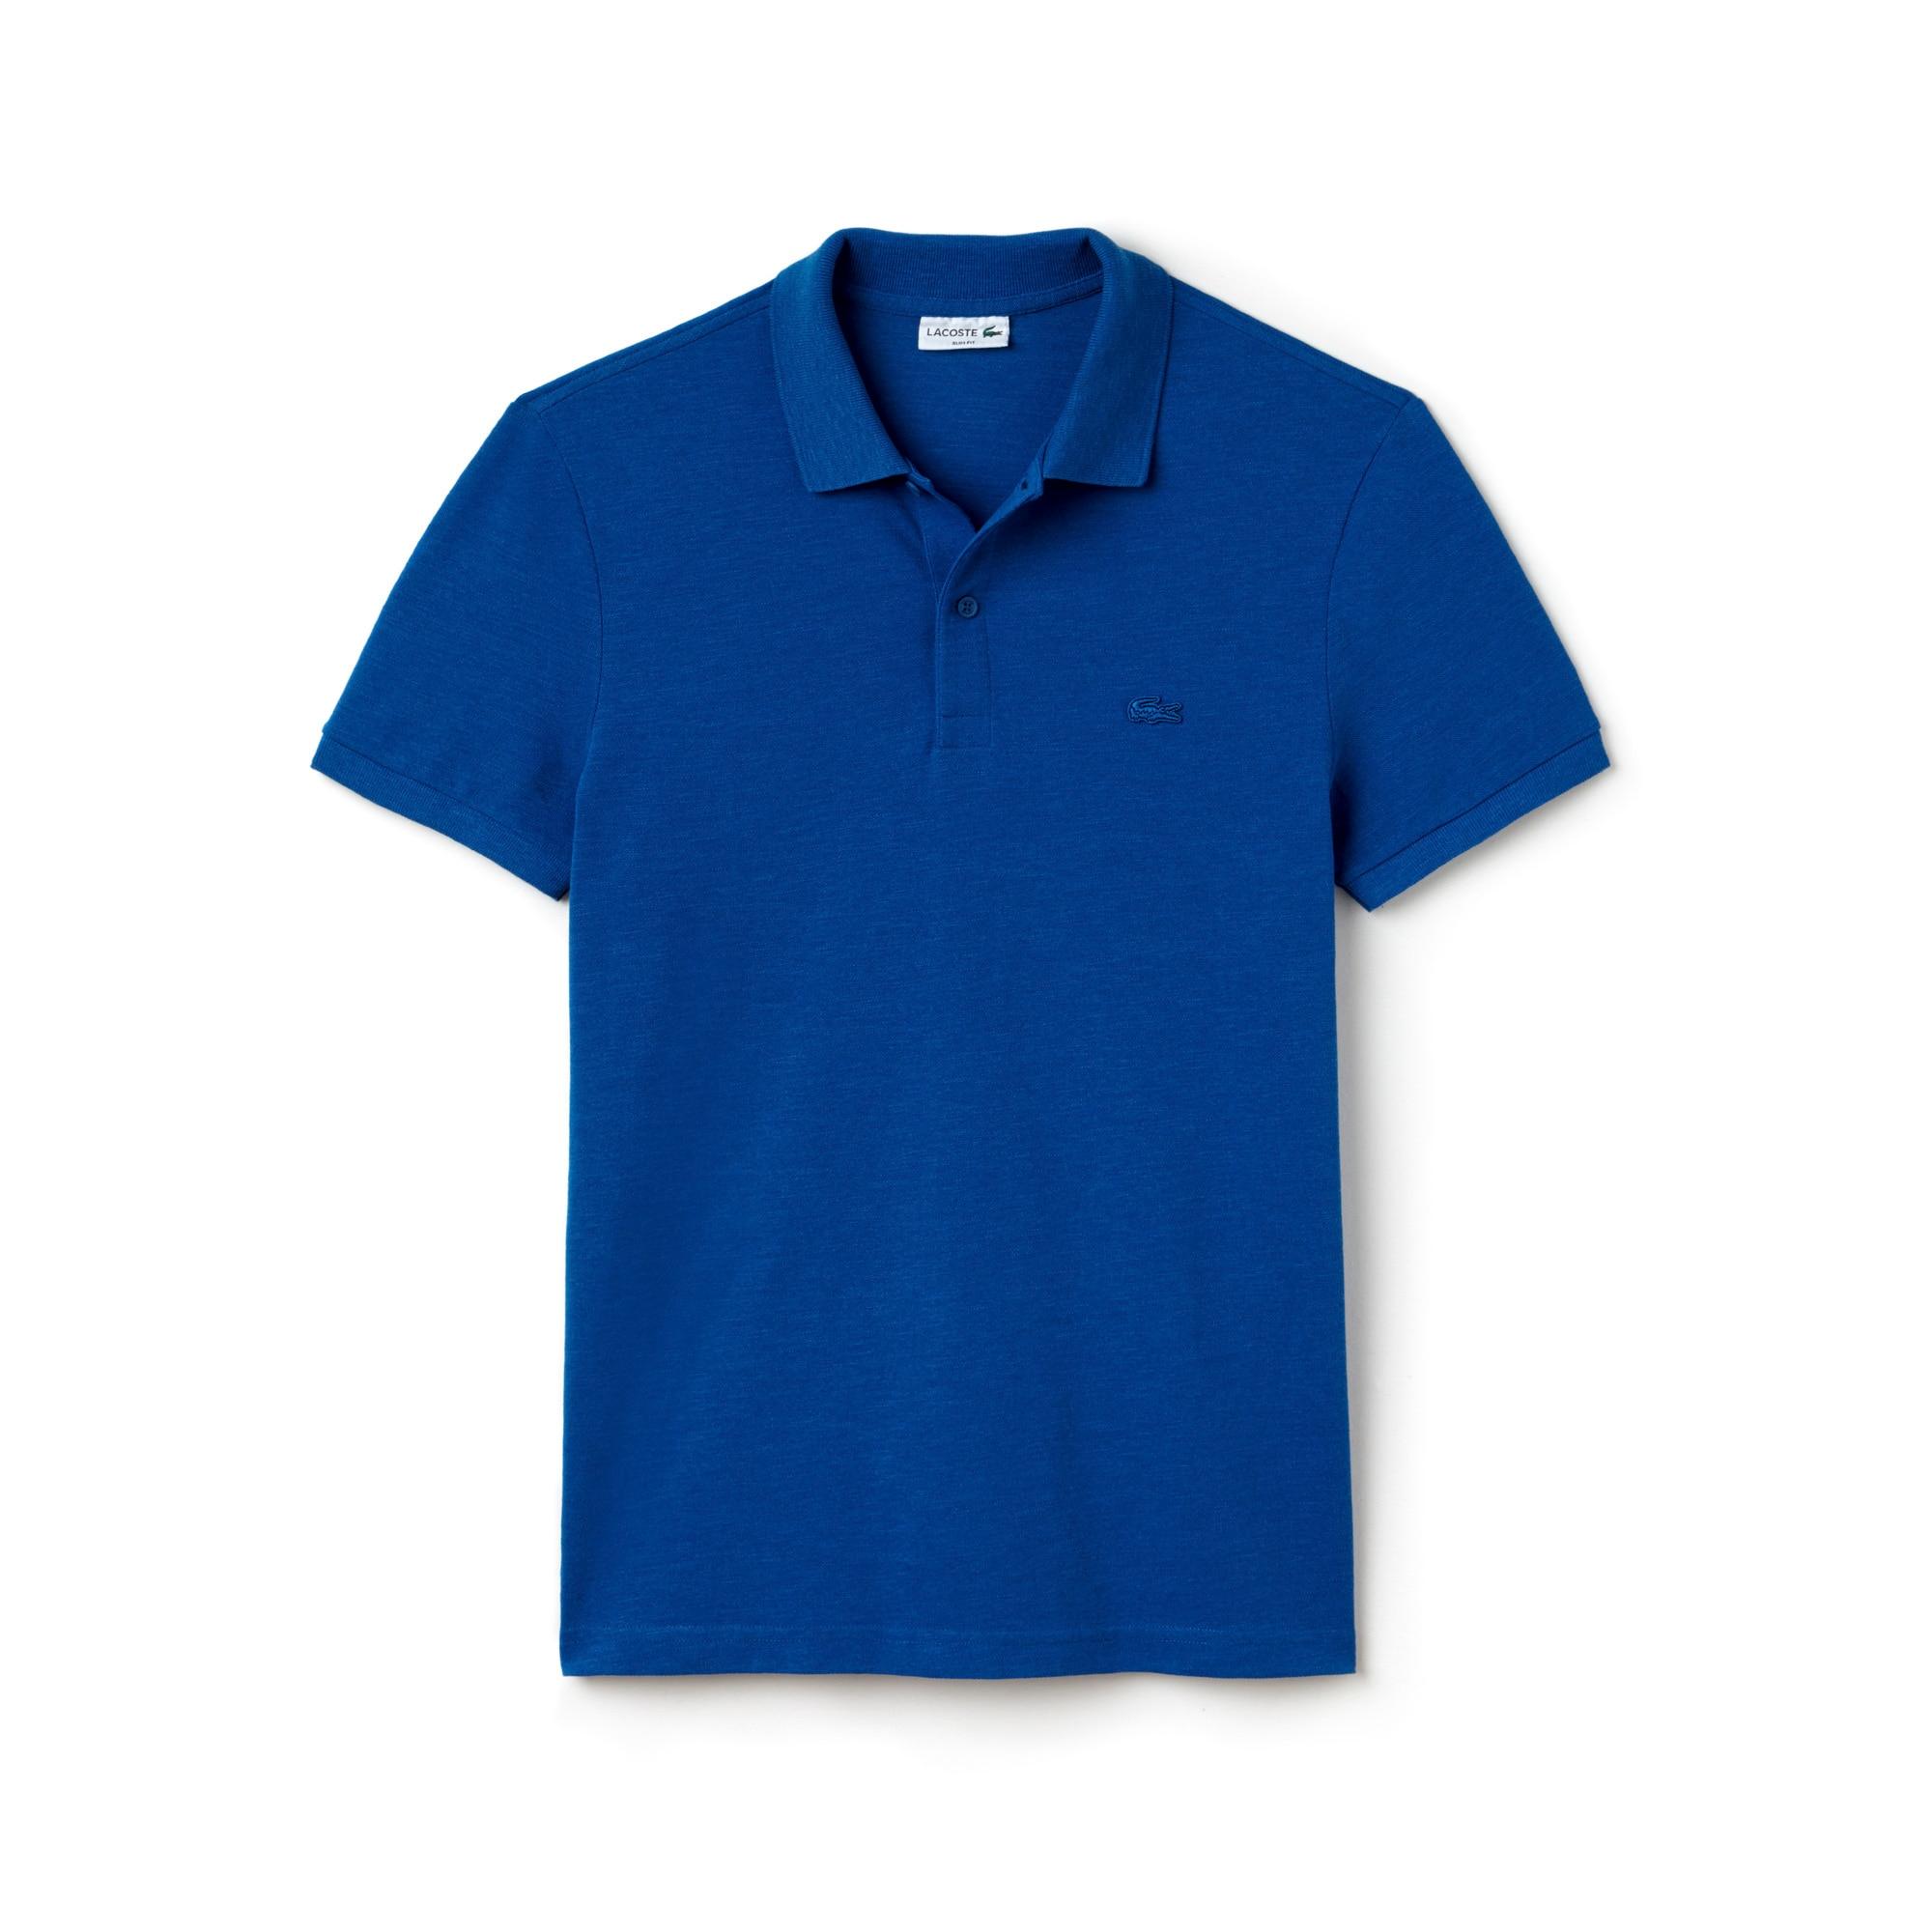 Men's Garment Dyed Vintage Polo Shirt